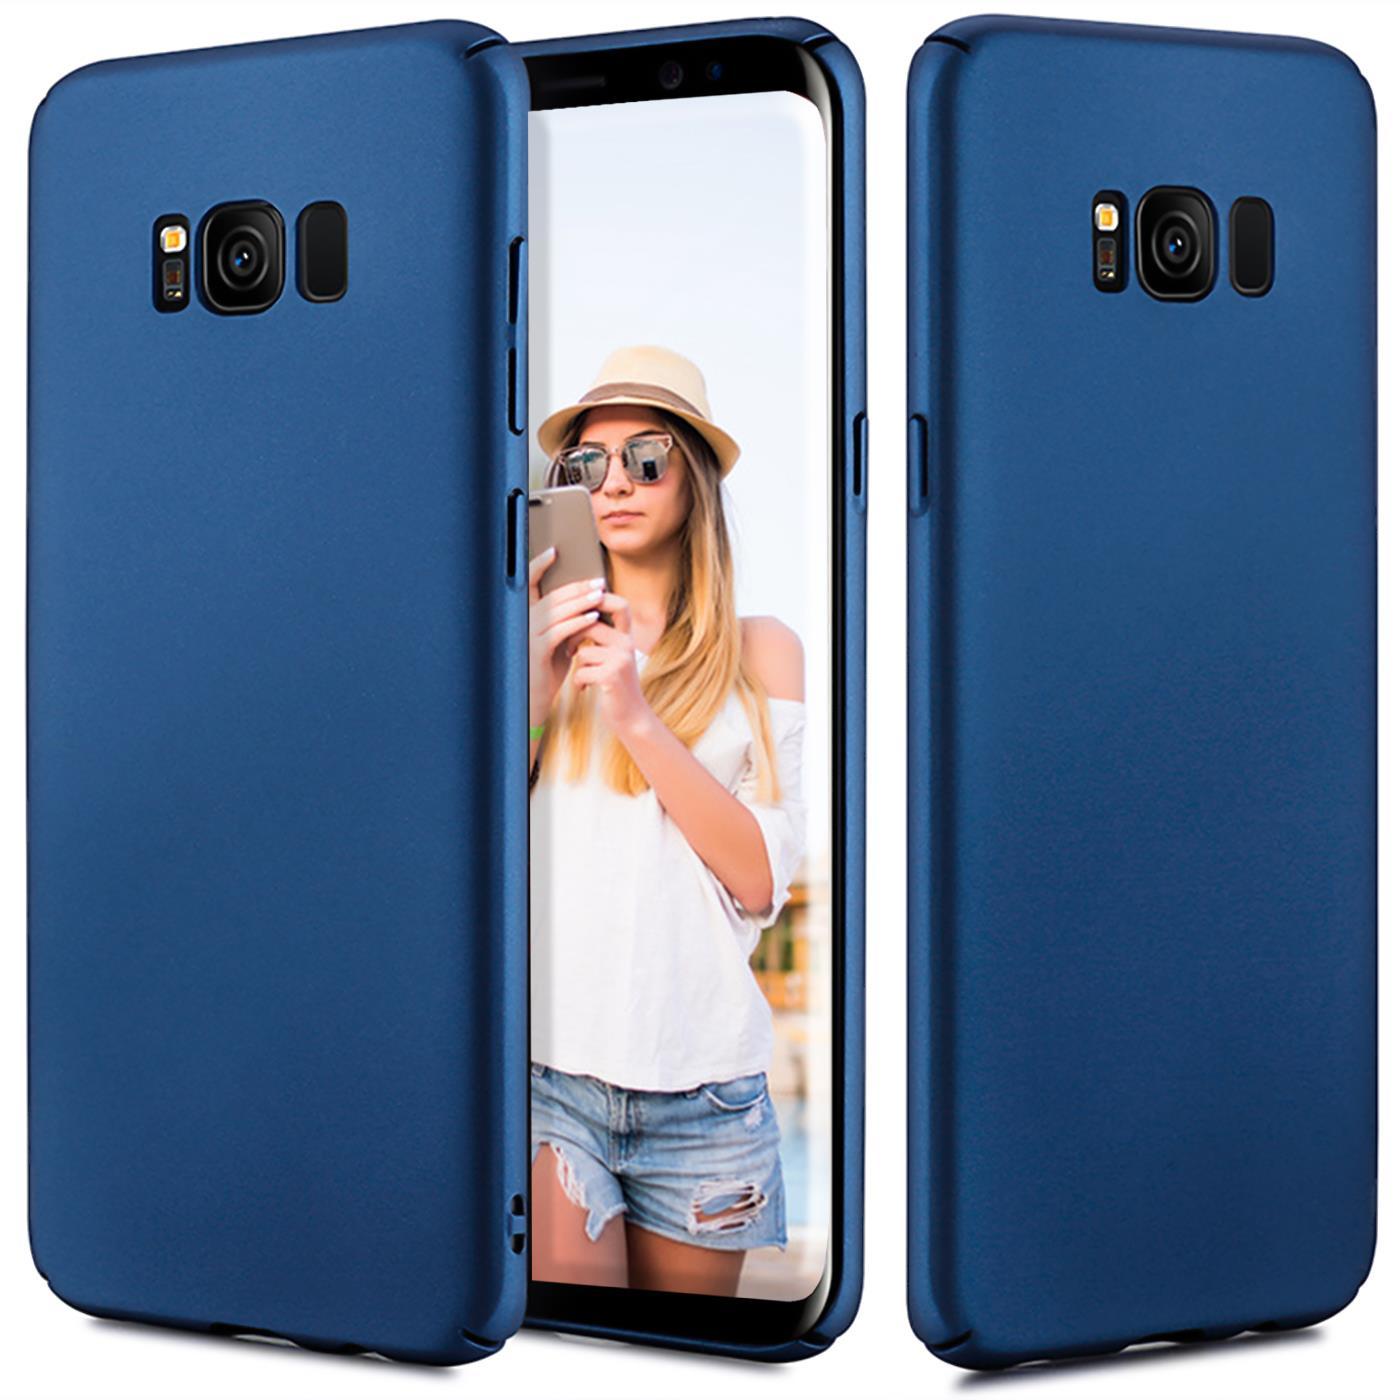 Hard-Back-Case-Cover-Samsung-Galaxy-s4-duenn-Cover-Slim-Shockproof-Rugged Indexbild 12